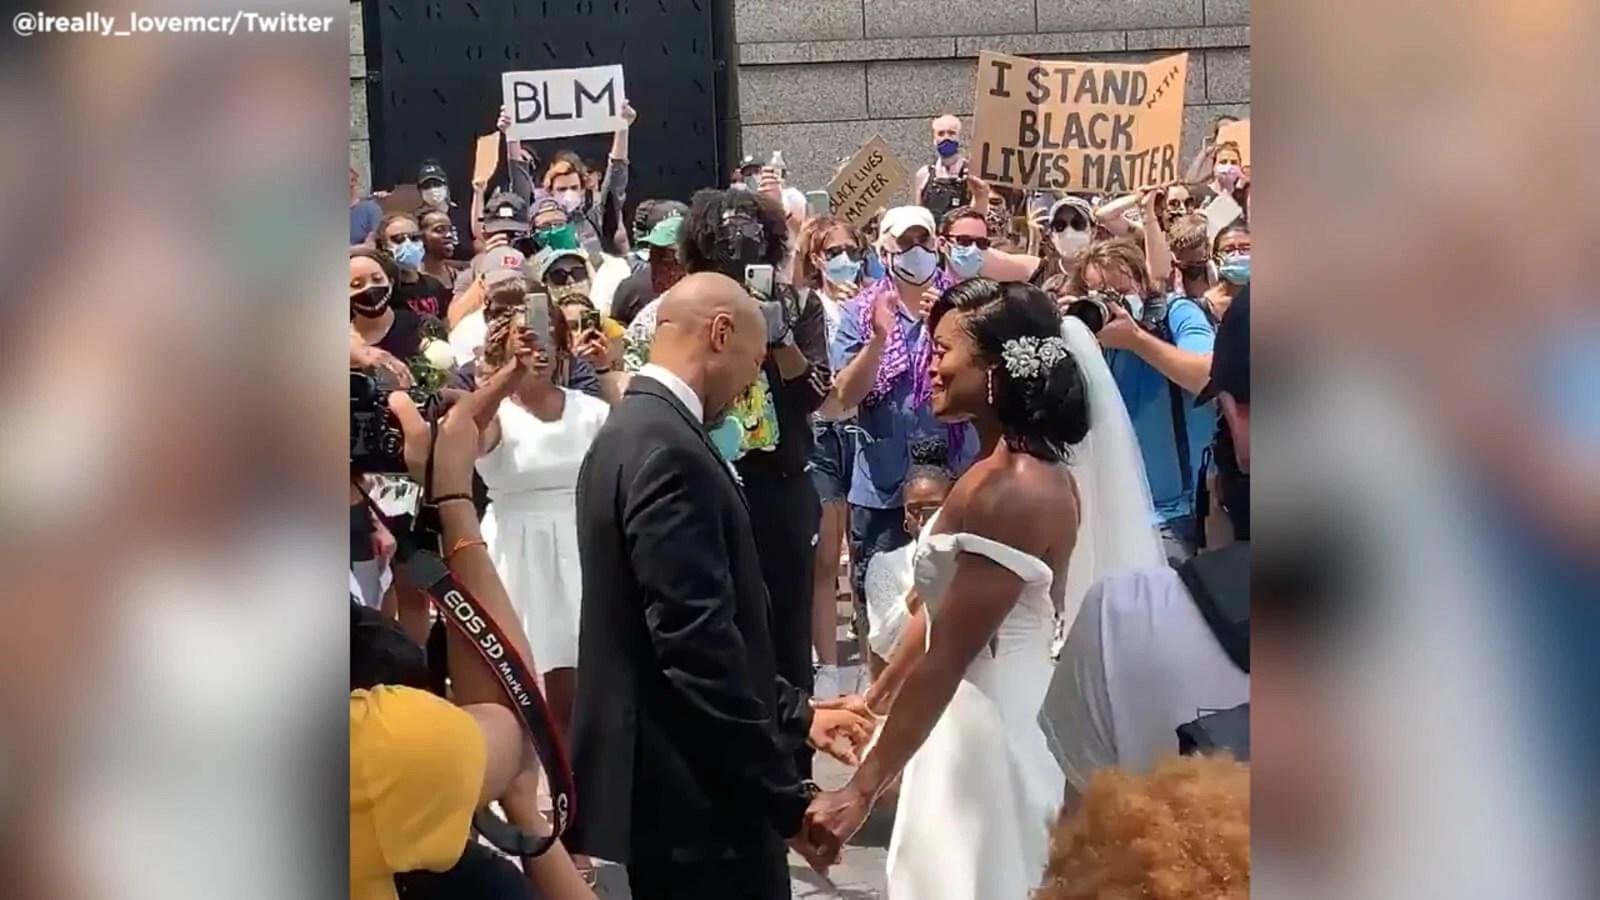 6236056 060720-cc-philly-protest-wedding-img jpg